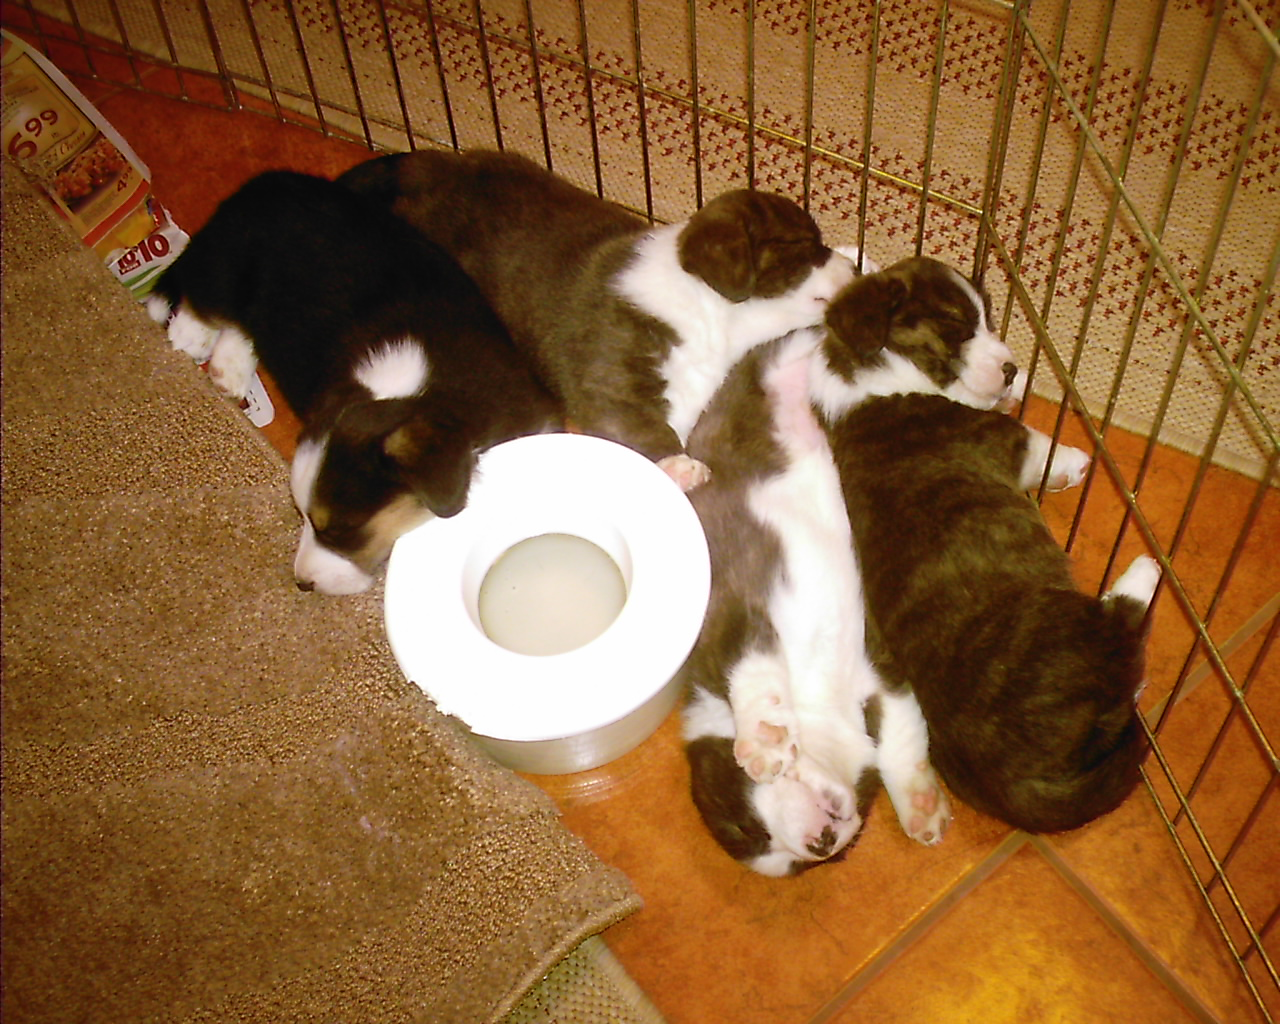 Why is a sleeping puppy pile so darn cute!